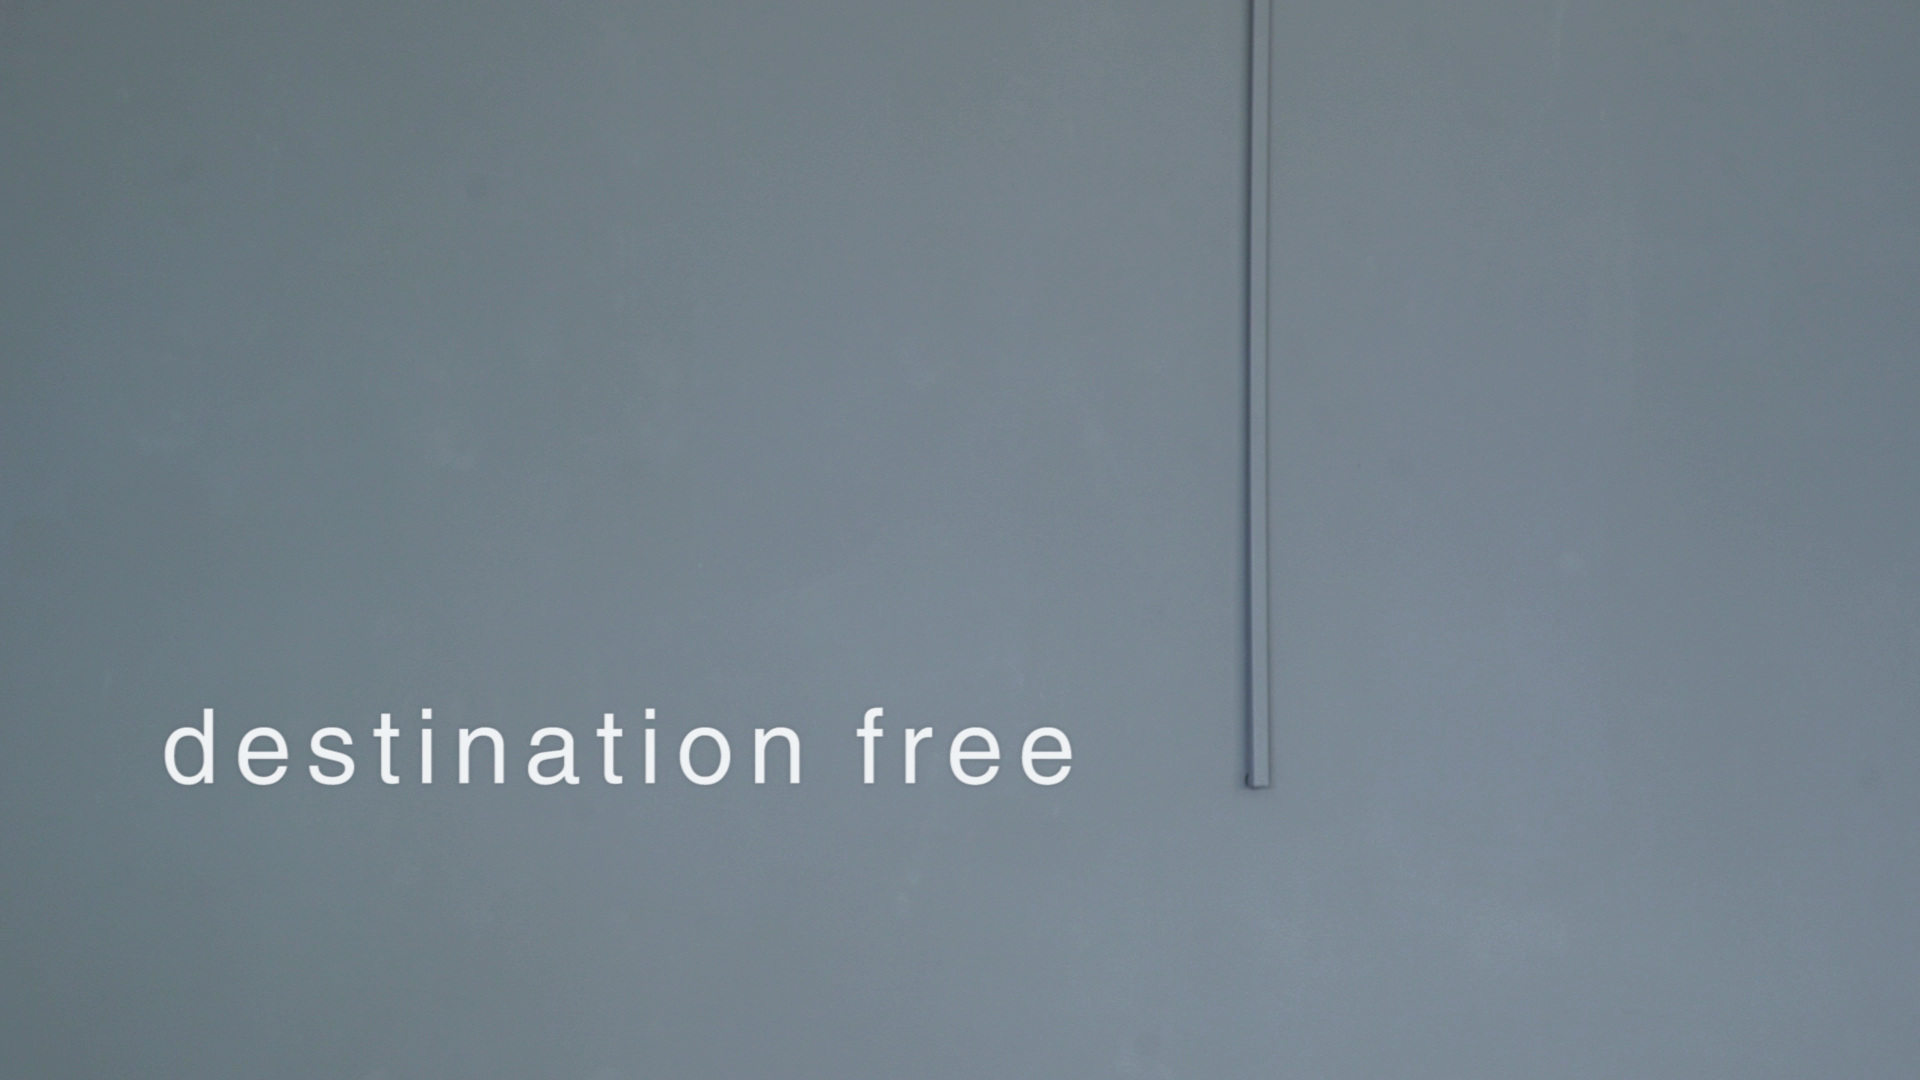 Destination Free